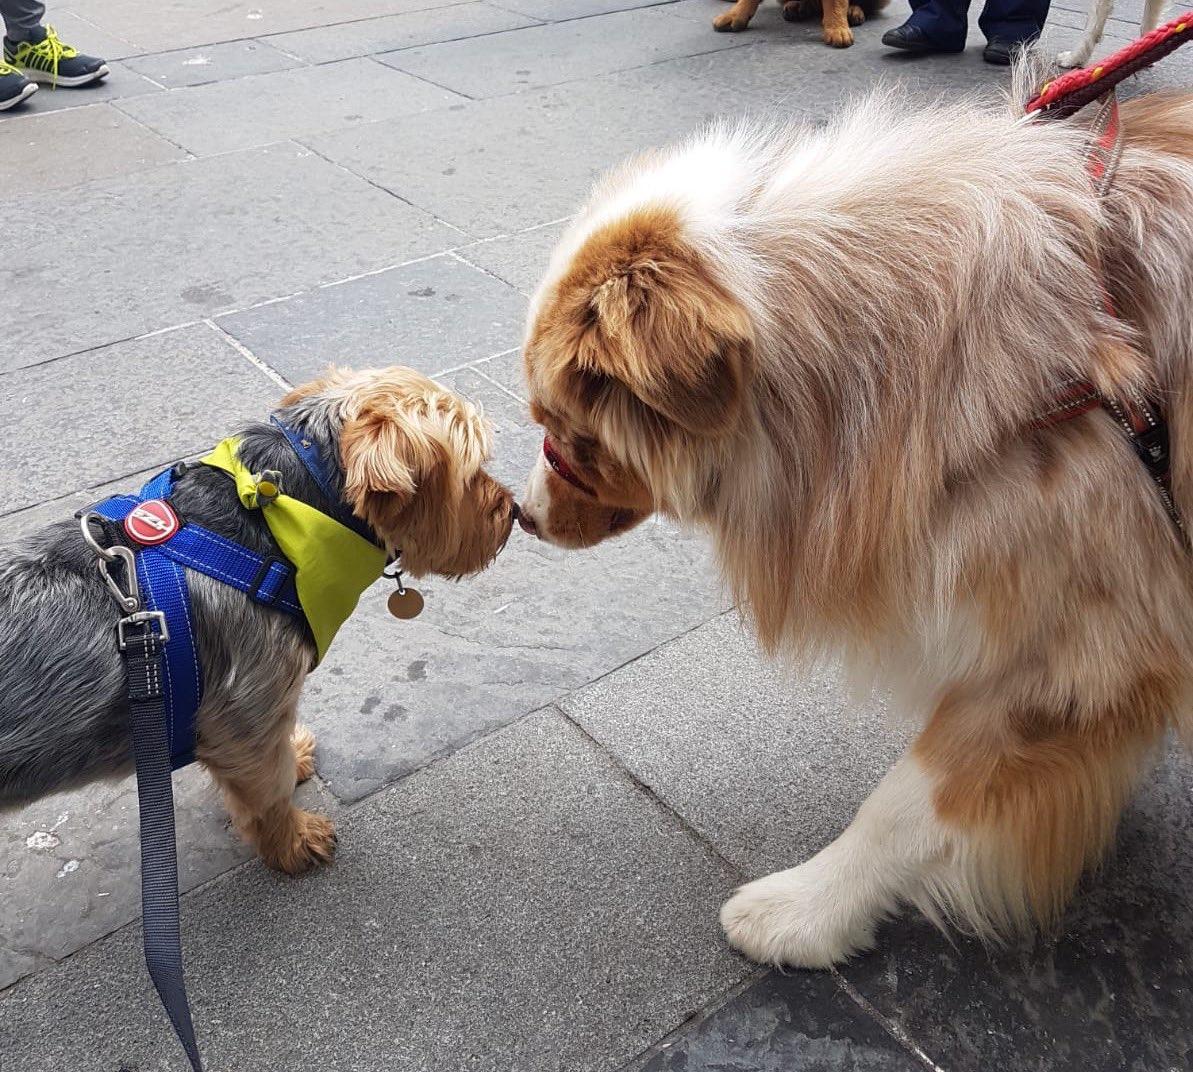 When a picture says a thousand words! #dogsontour #dogfriendlytours ♥️🐾